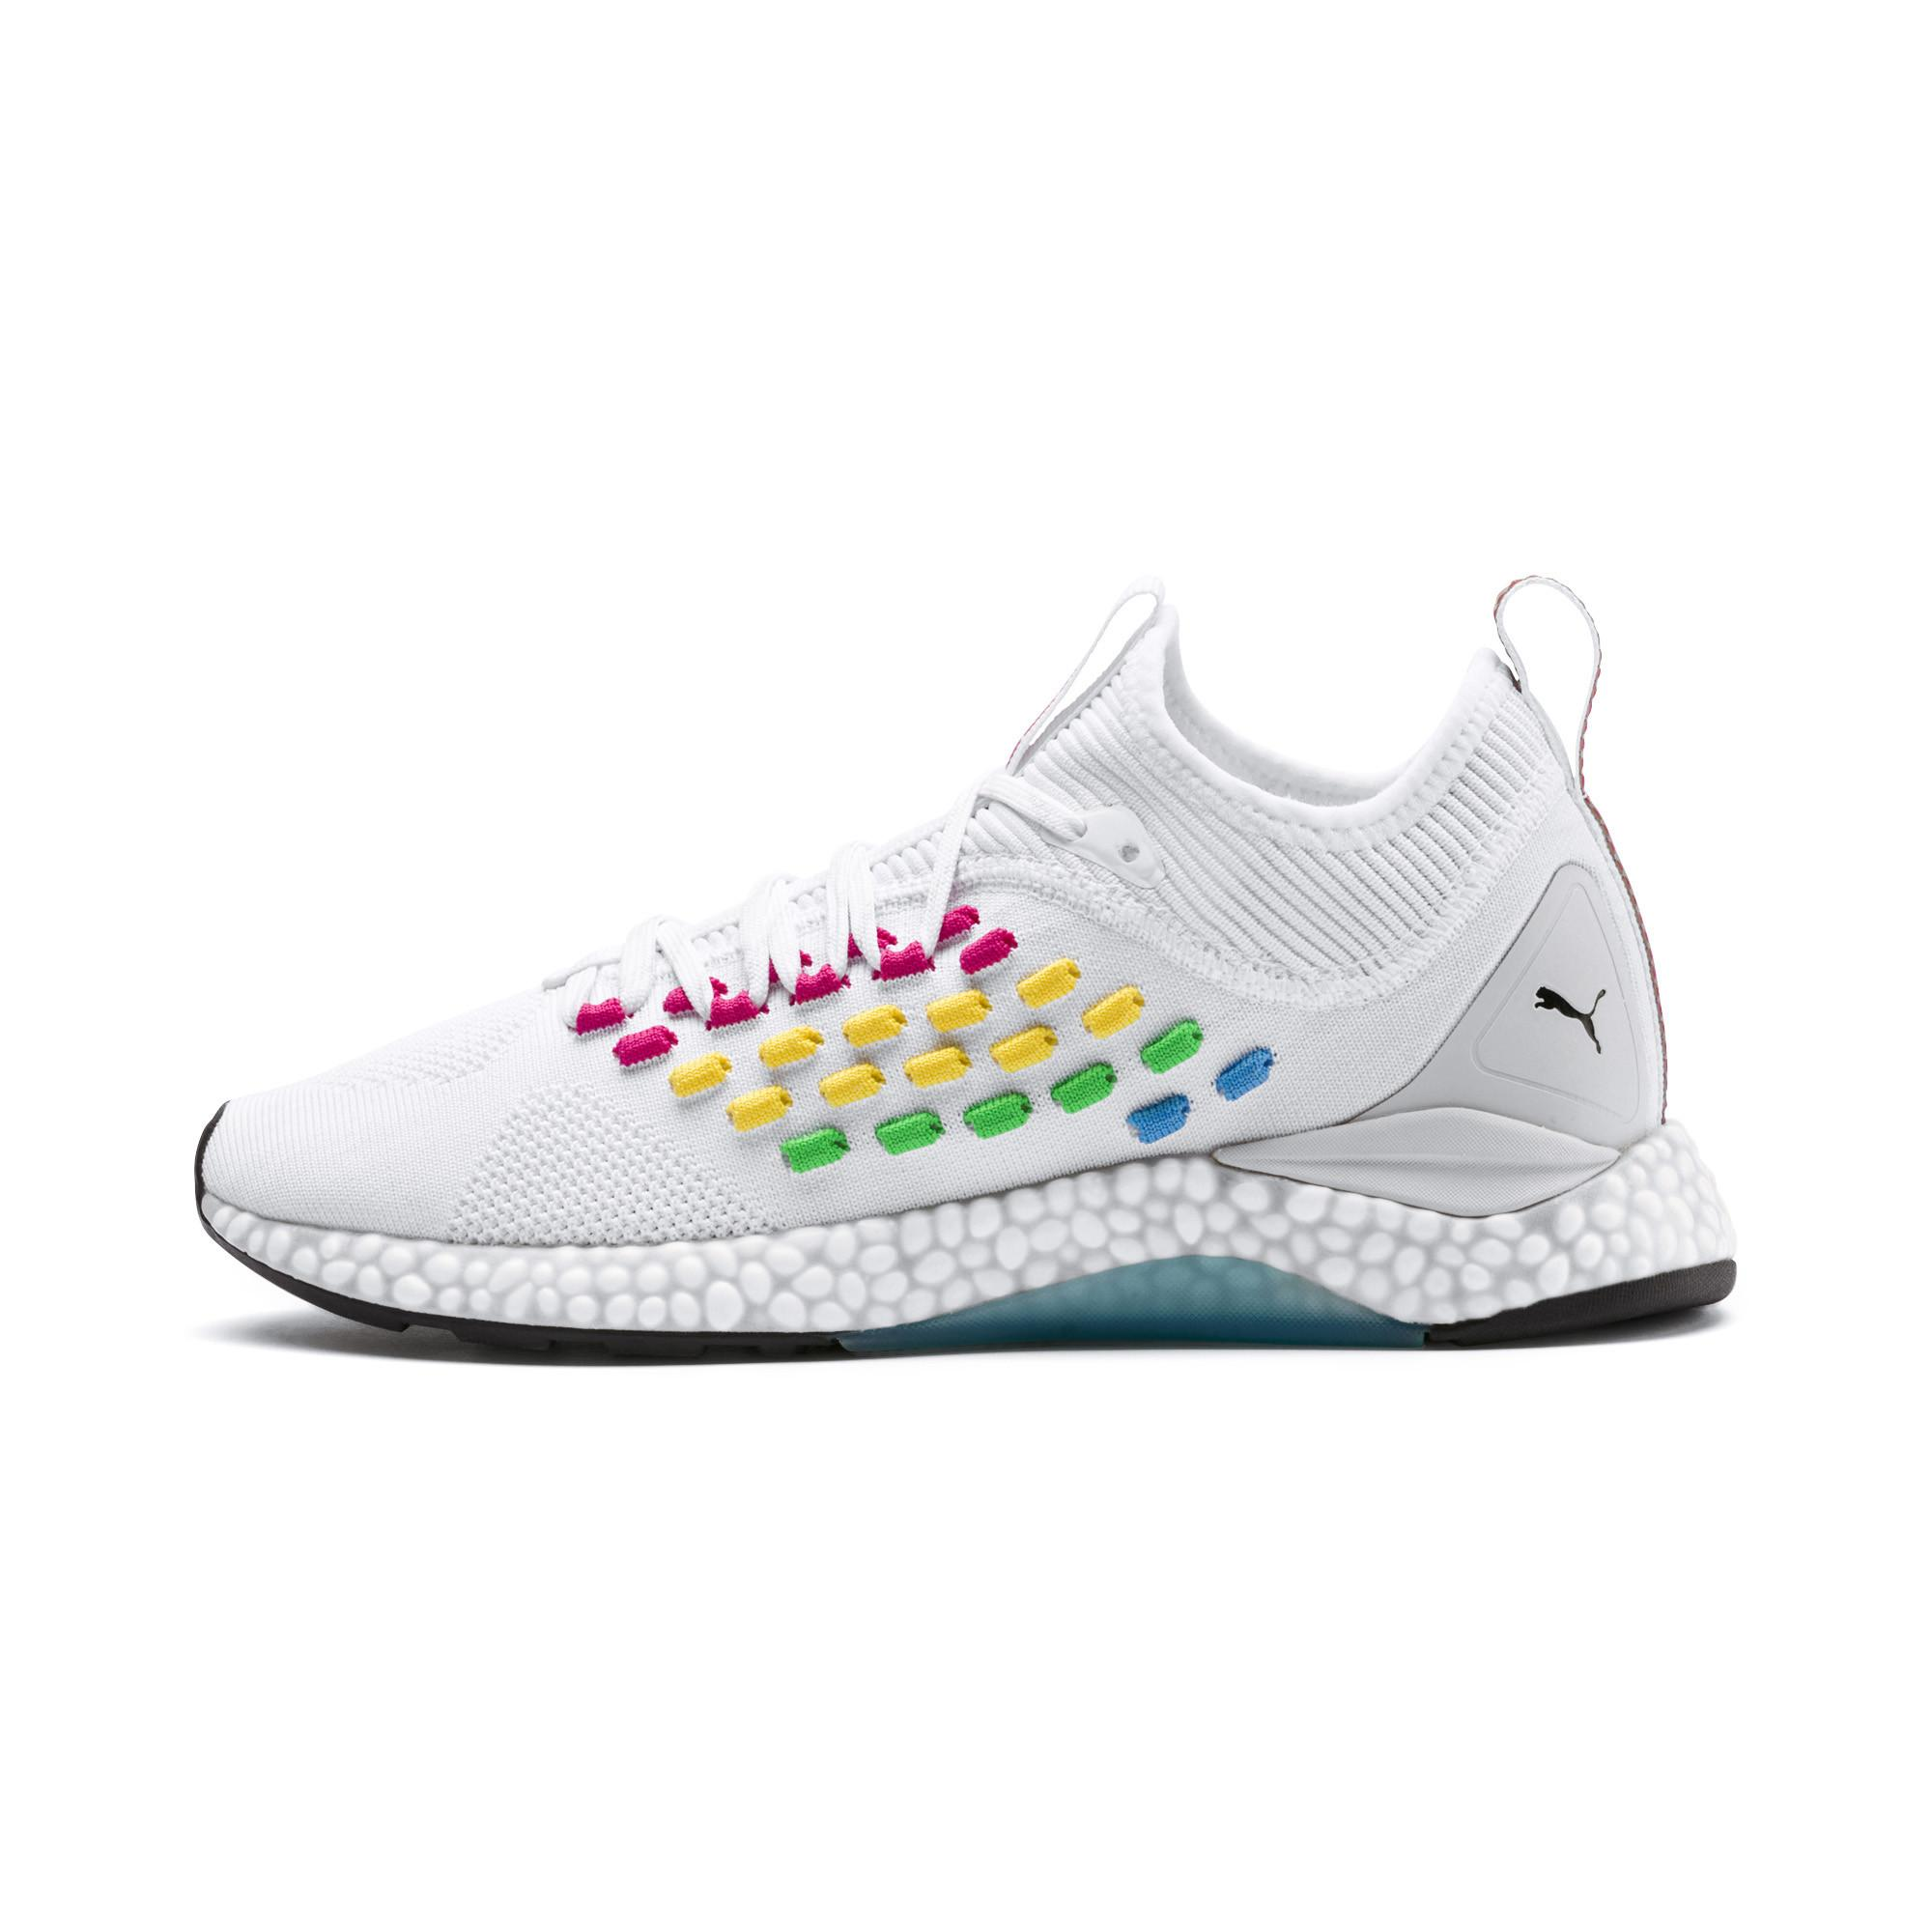 890eb488242a7b Lyst - PUMA Fusefit Heatmap Women s Running Shoes in White